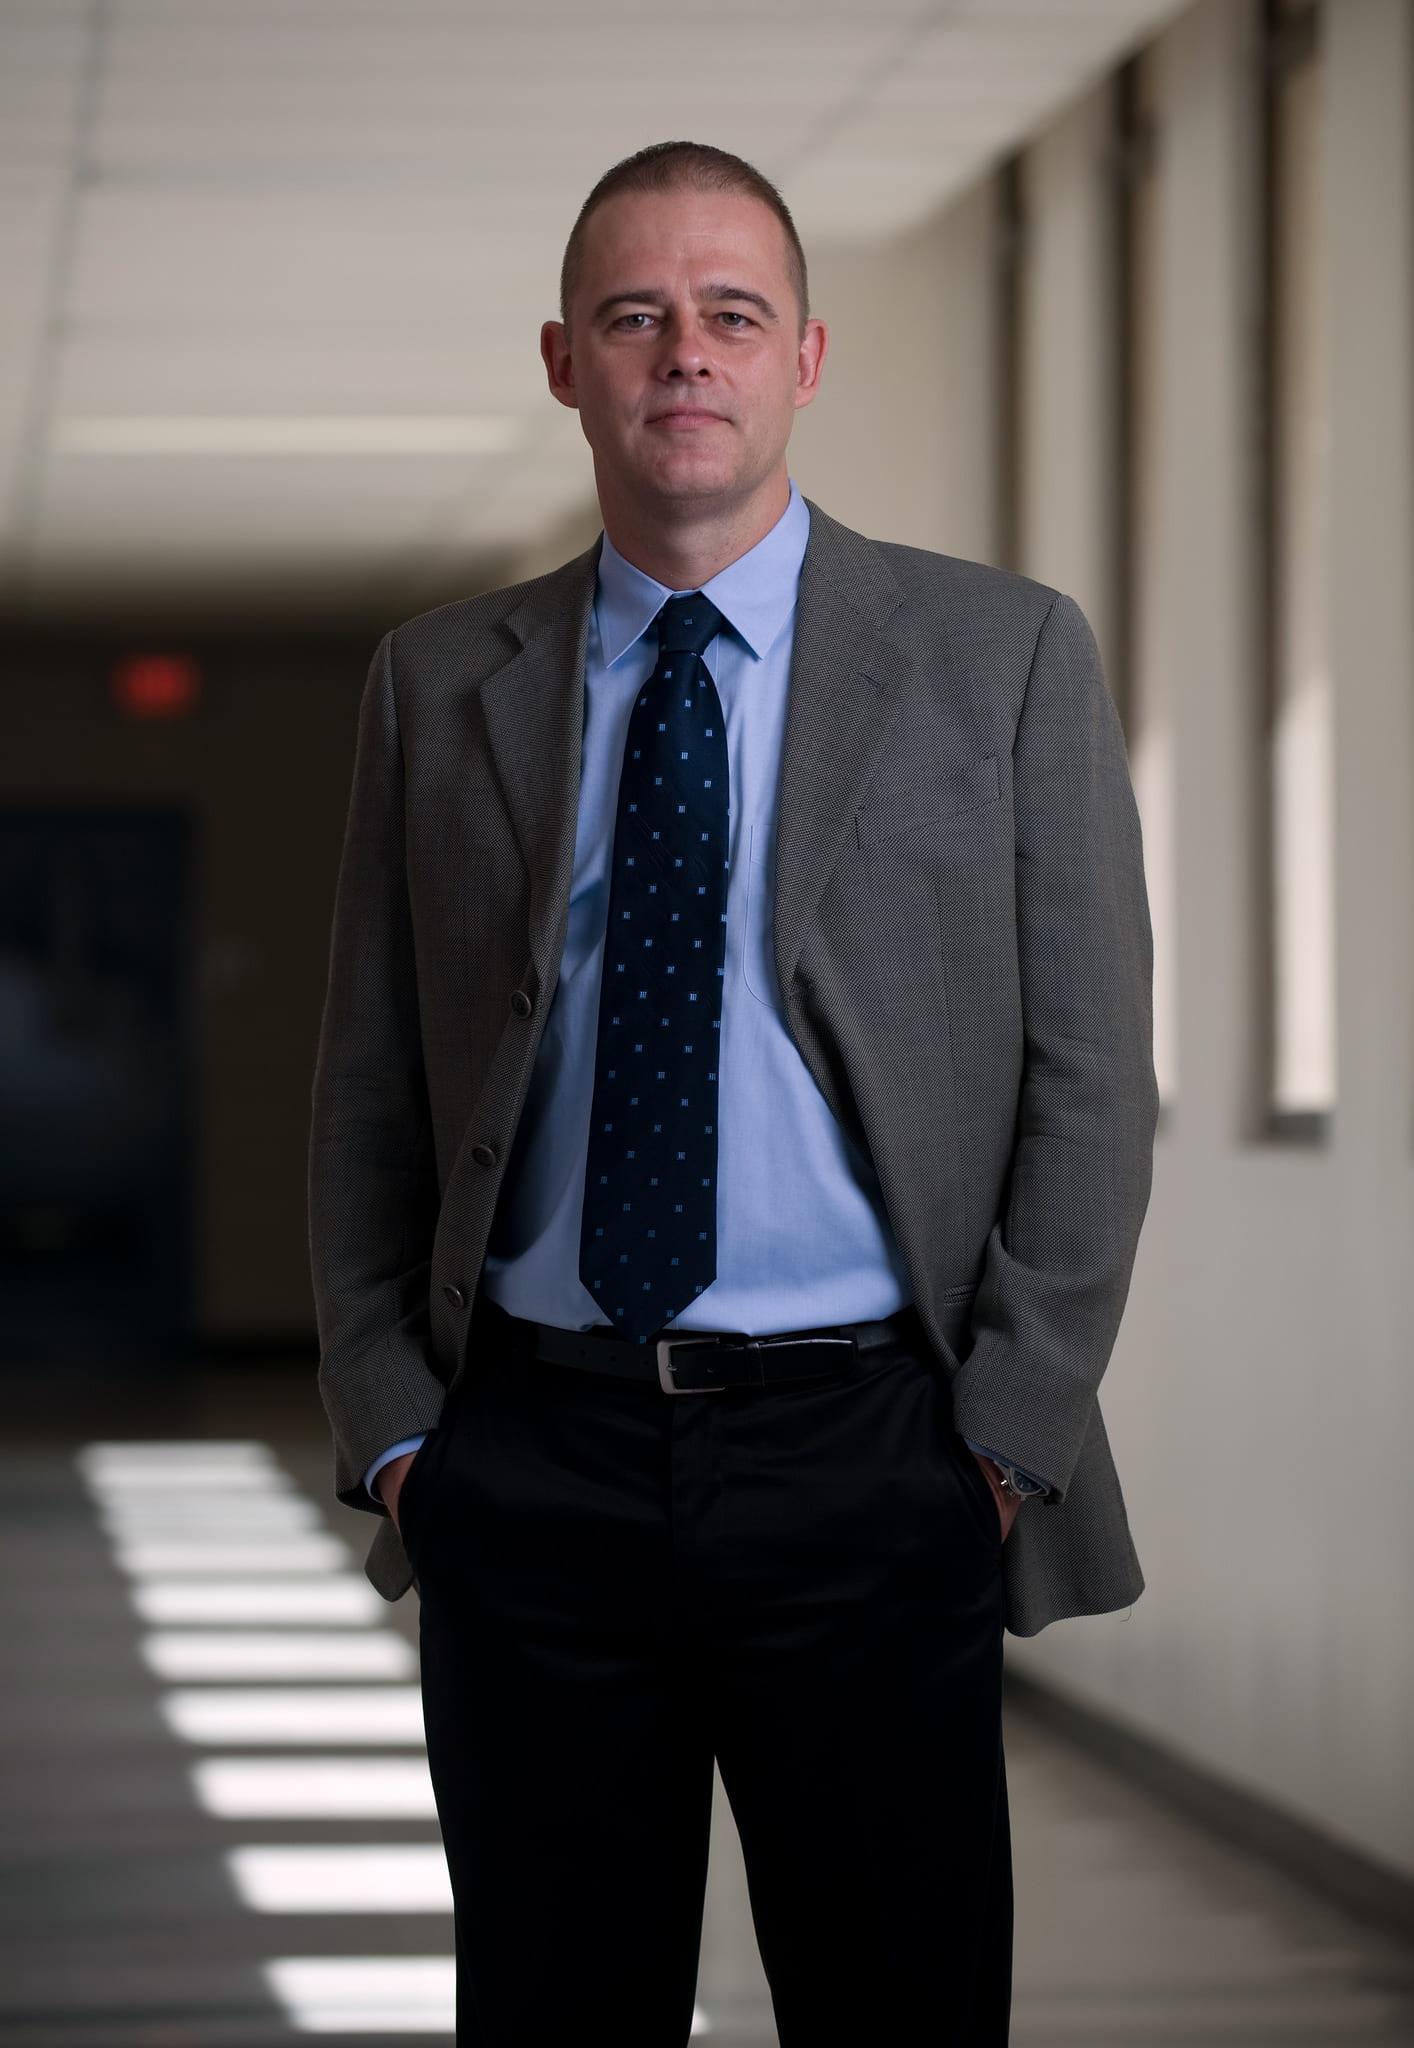 Michael Franz